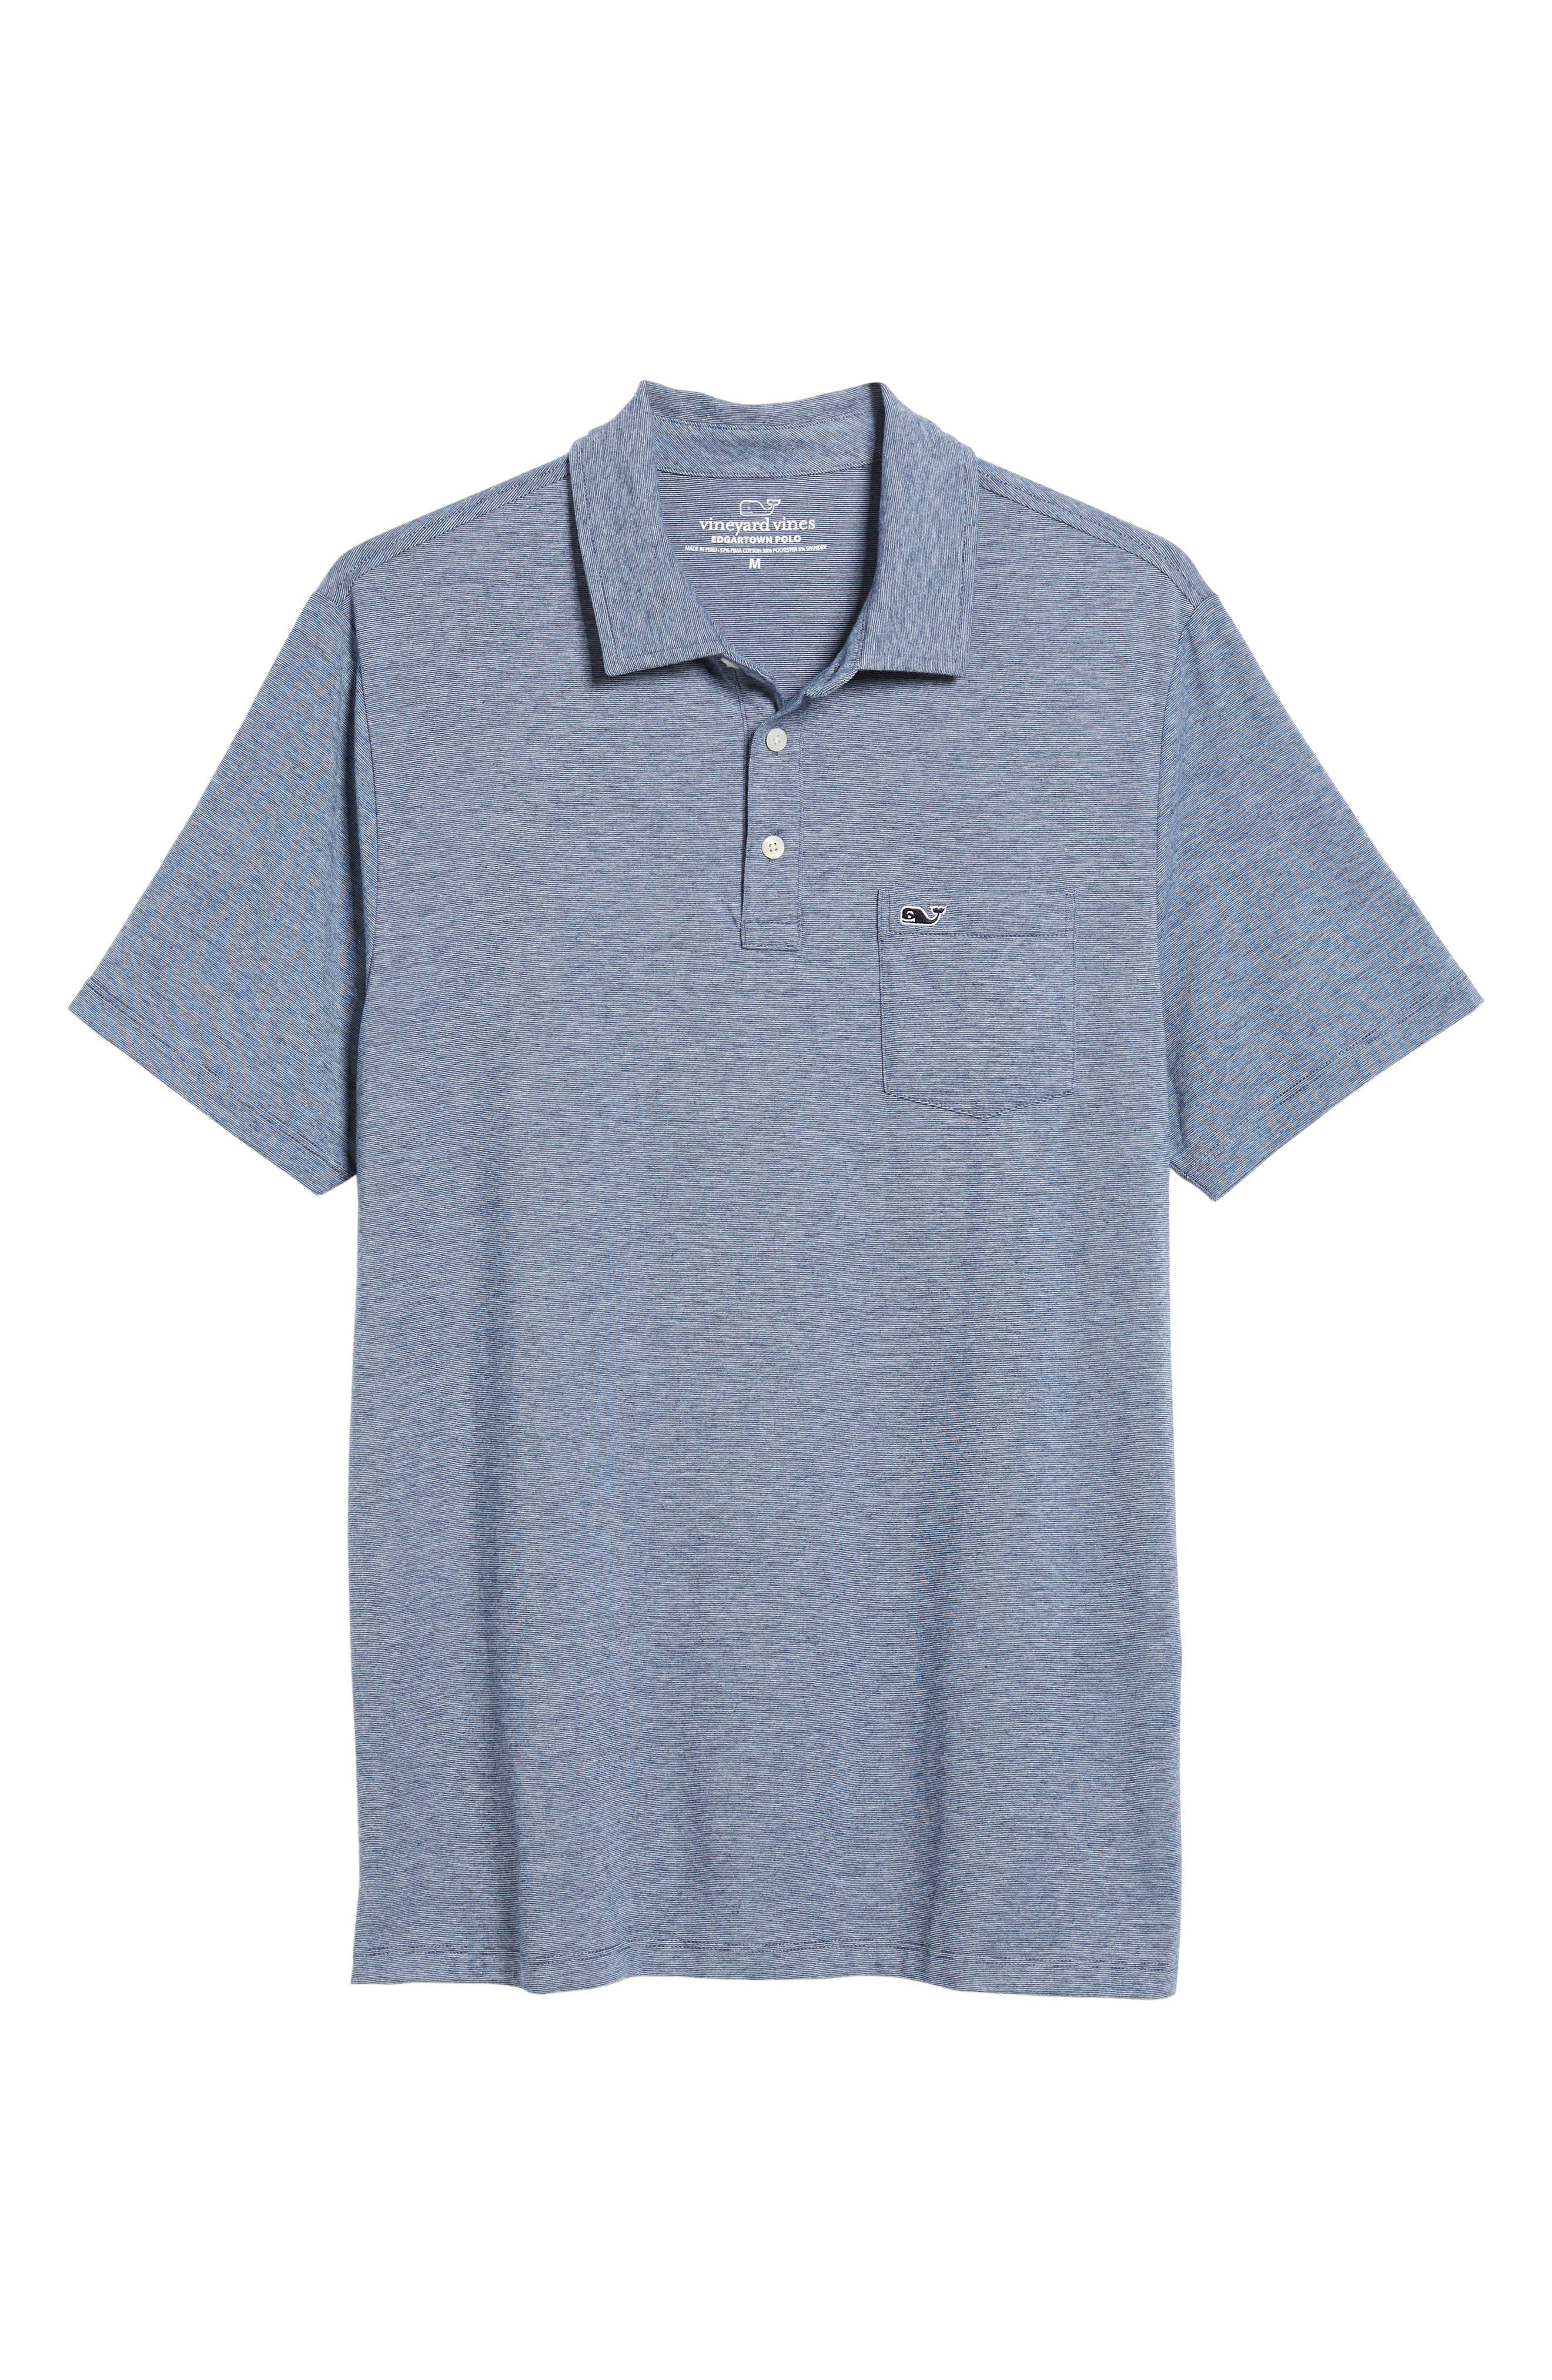 VINEYARD VINES,                             Edgartown Polo Shirt,                             Alternate thumbnail 6, color,                             DEEP BAY